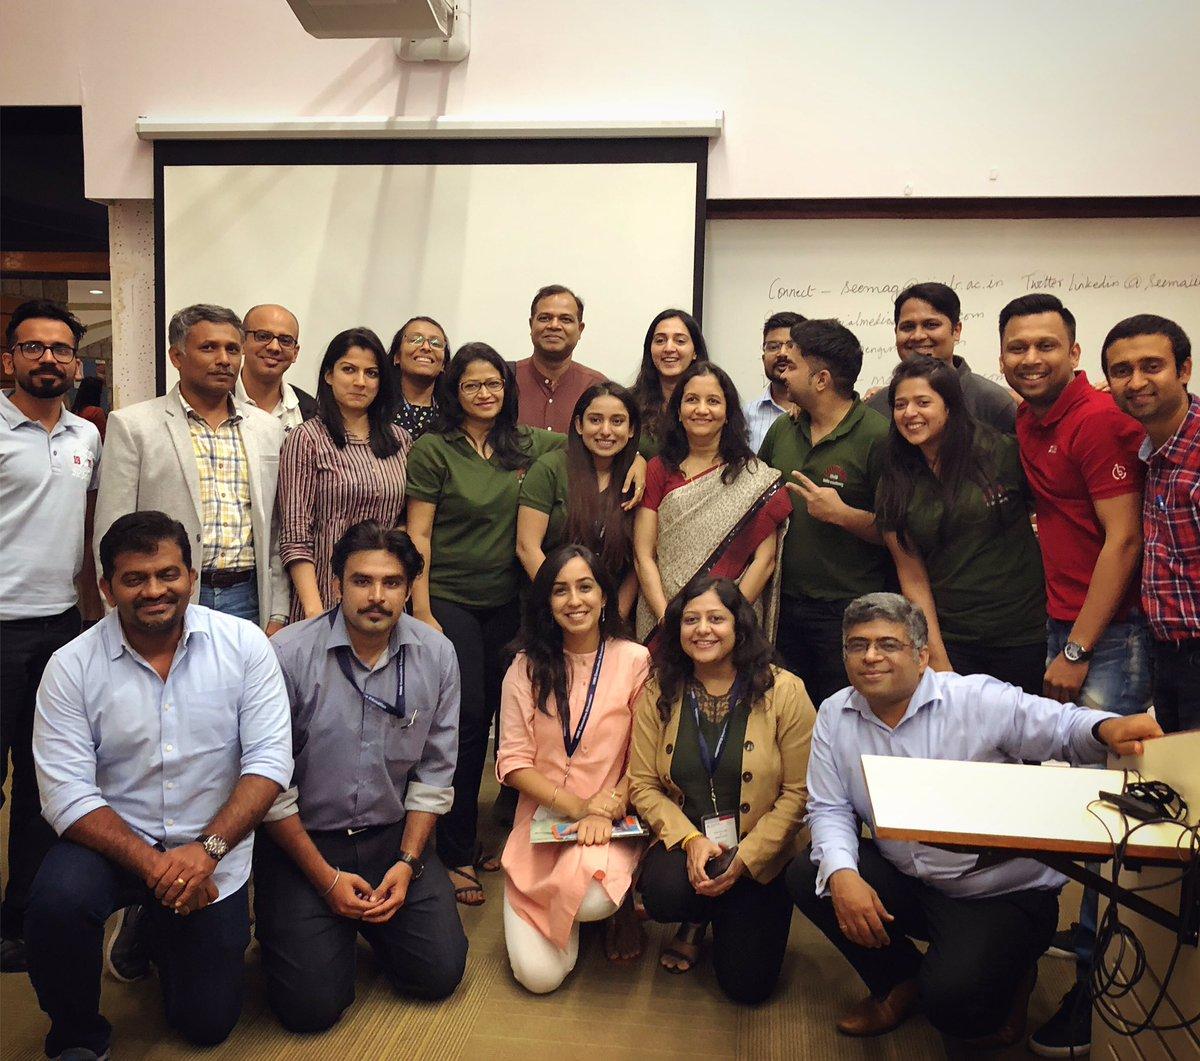 Snapped! @IIM_Bangalore #IIMB #DigitalIndia #DigitalMarketing #SocialMedia https://t.co/zDVgYvf52c